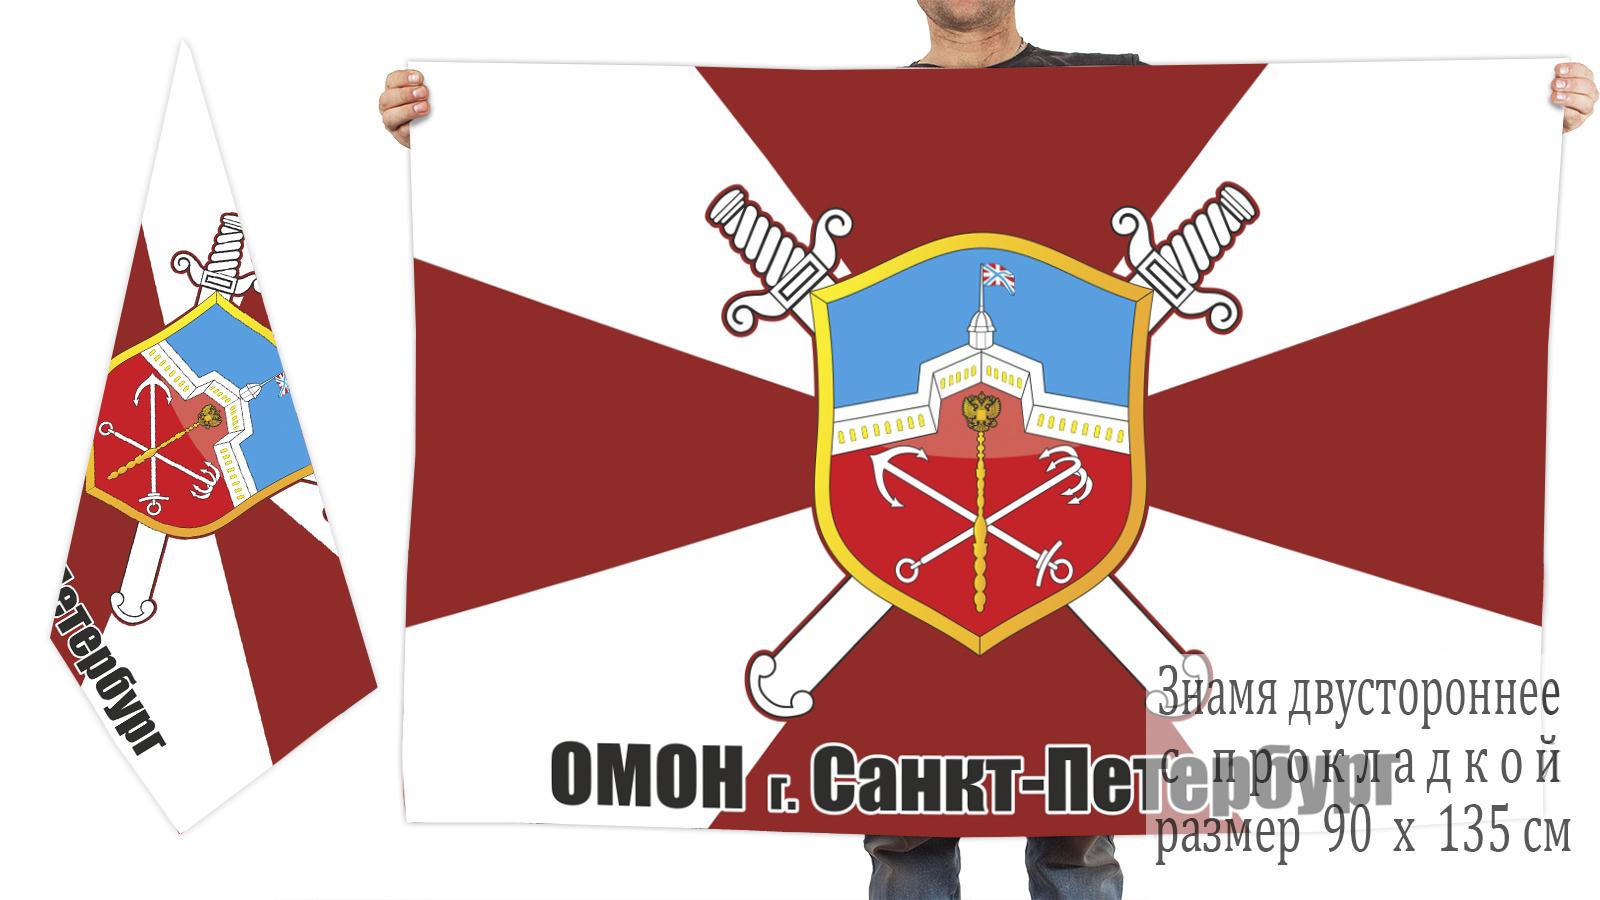 Двухсторонний флаг ОМОН (Росгвардии) по Санкт-Петербургу и Ленинградской области